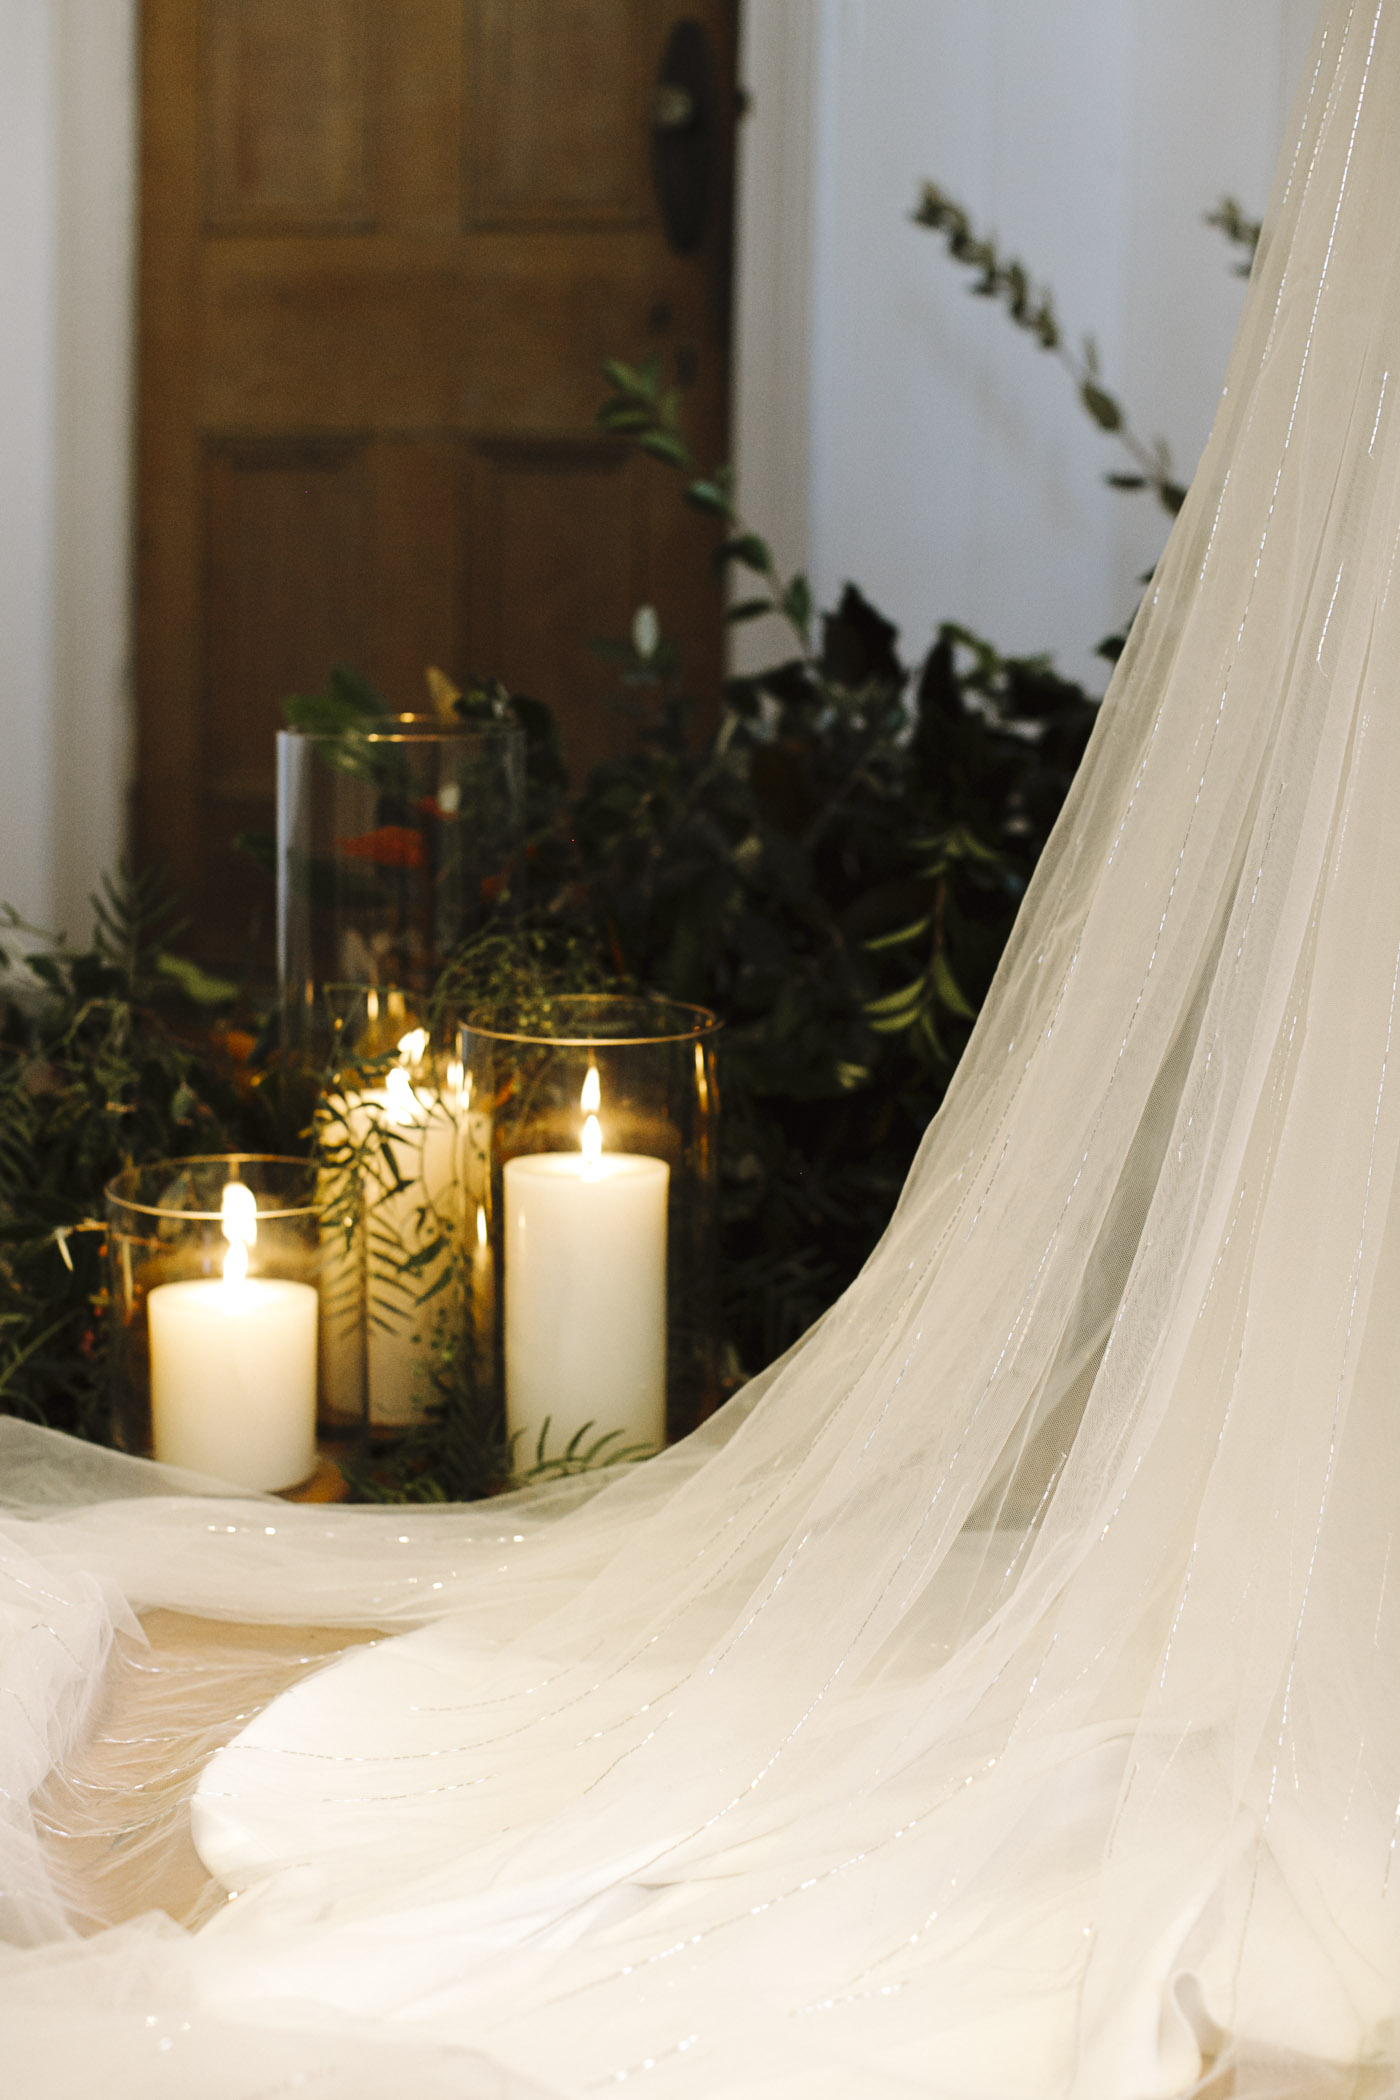 170707_justinaaron_wedding_krystal_greg_w-177.jpg